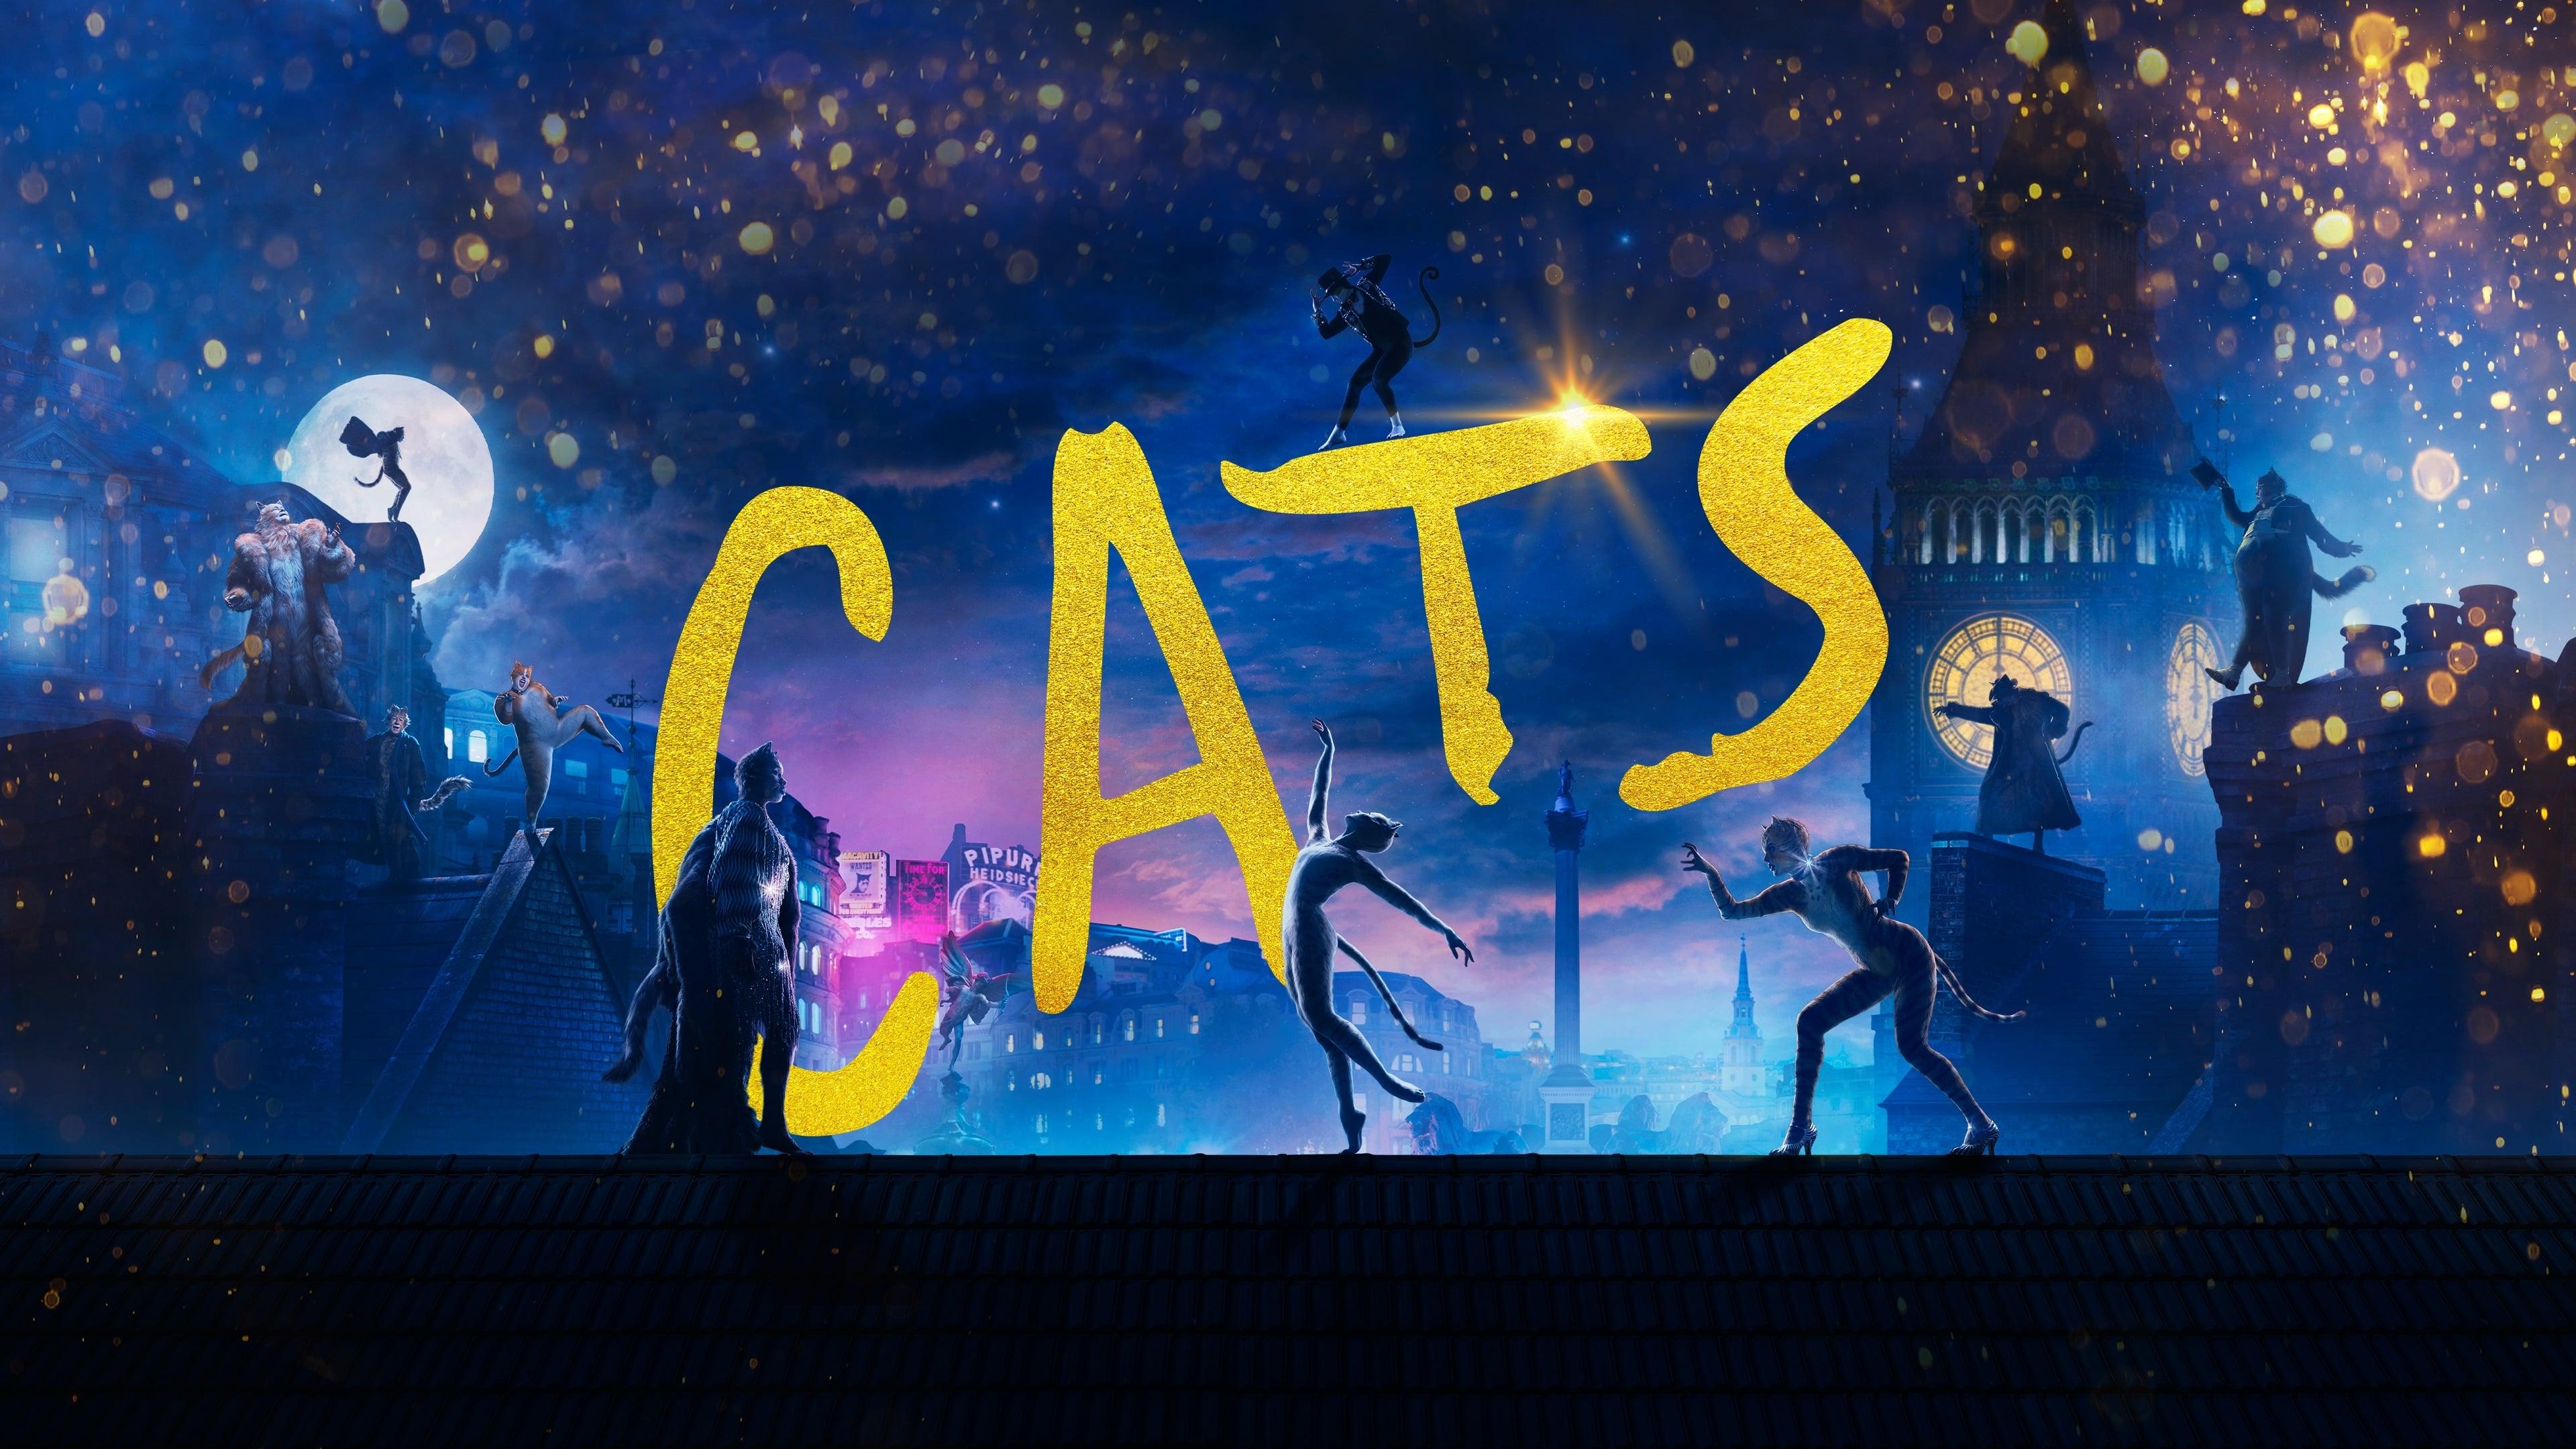 Filmszene aus Cats